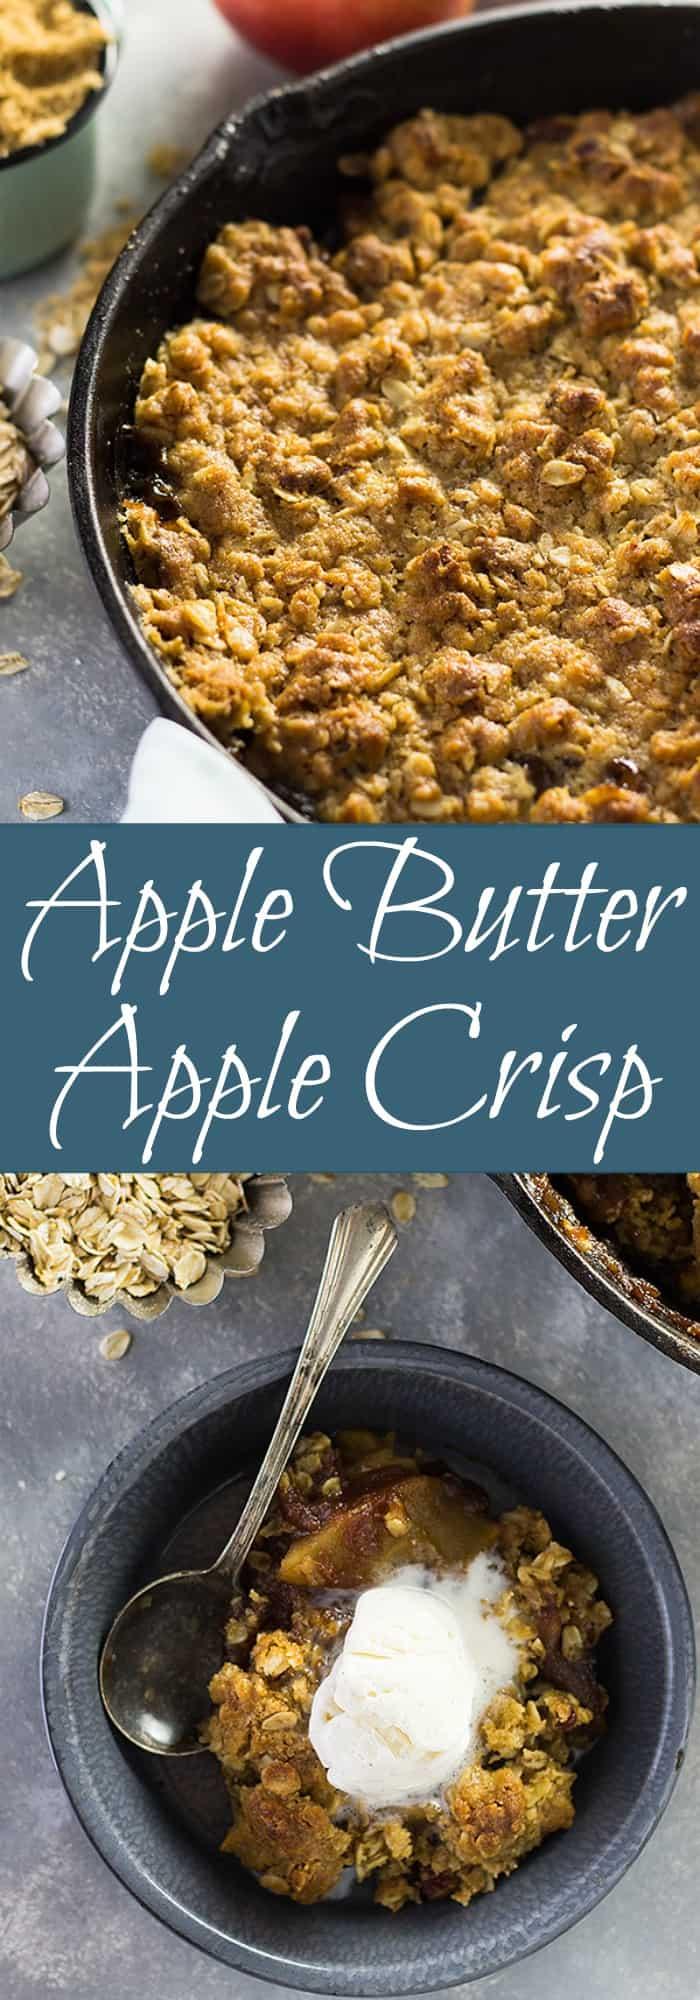 Apple Crisp Recipe Oatmeal Topping | Chekwiki.co